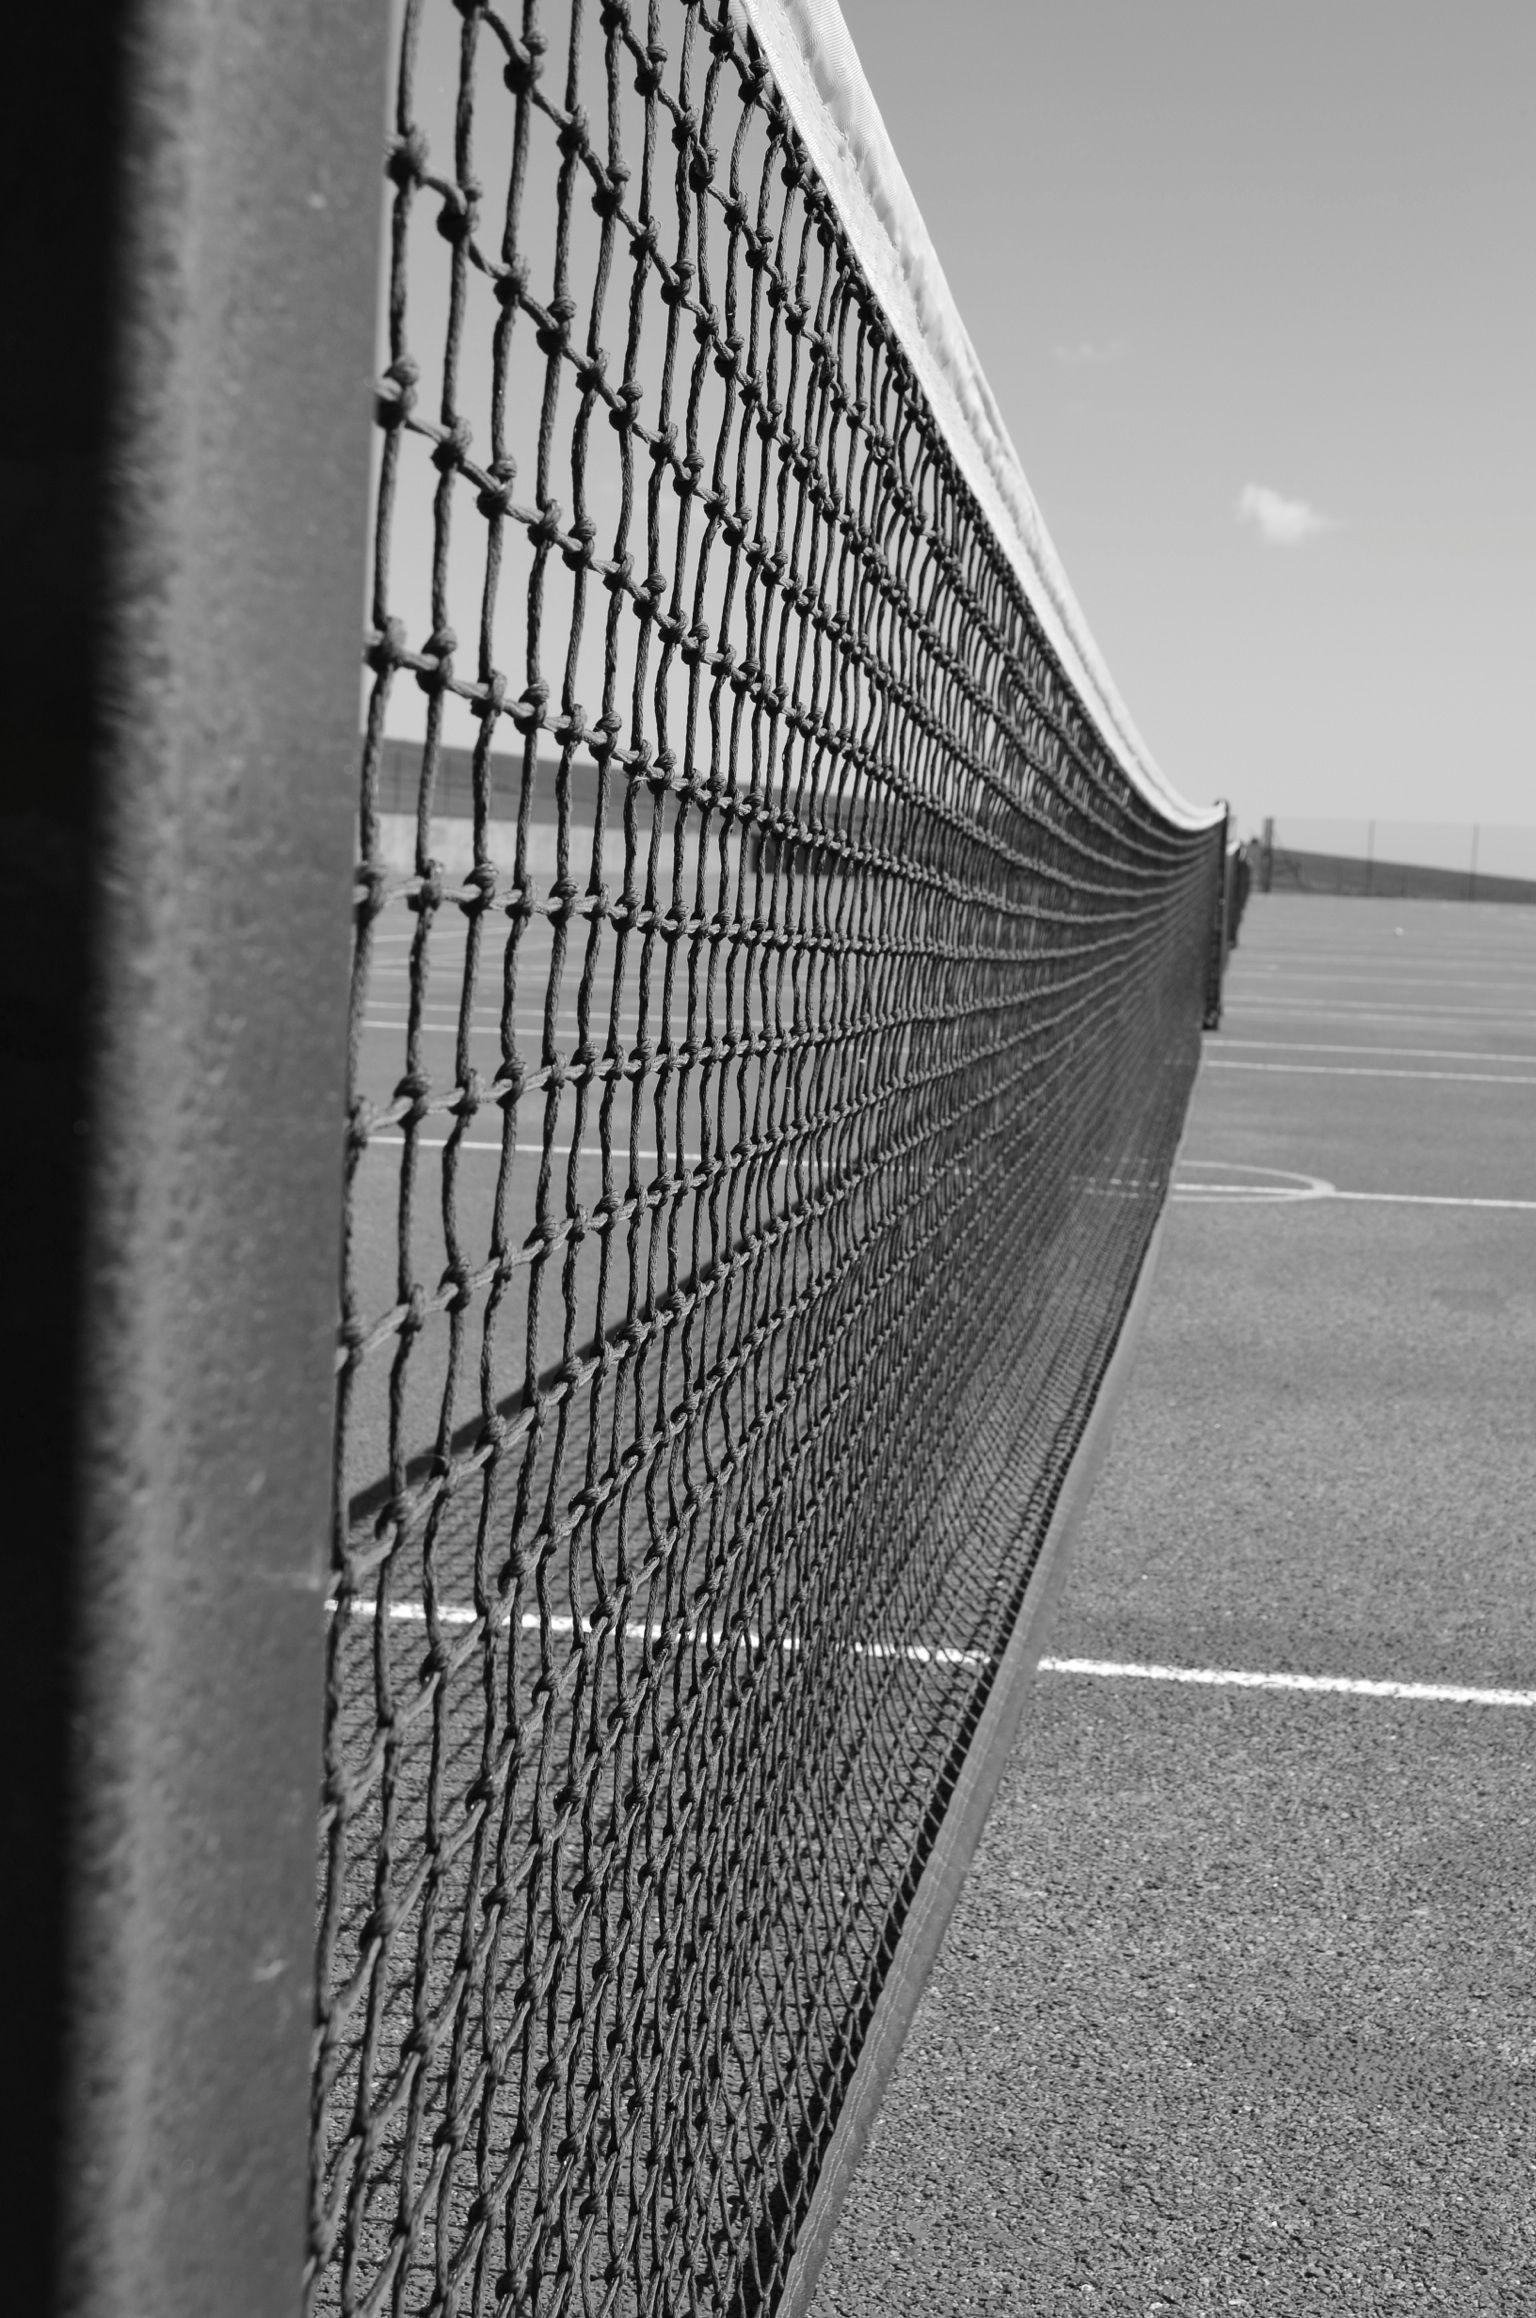 The Top 10 Reasons to Play Tennis! - PlayTennis.com